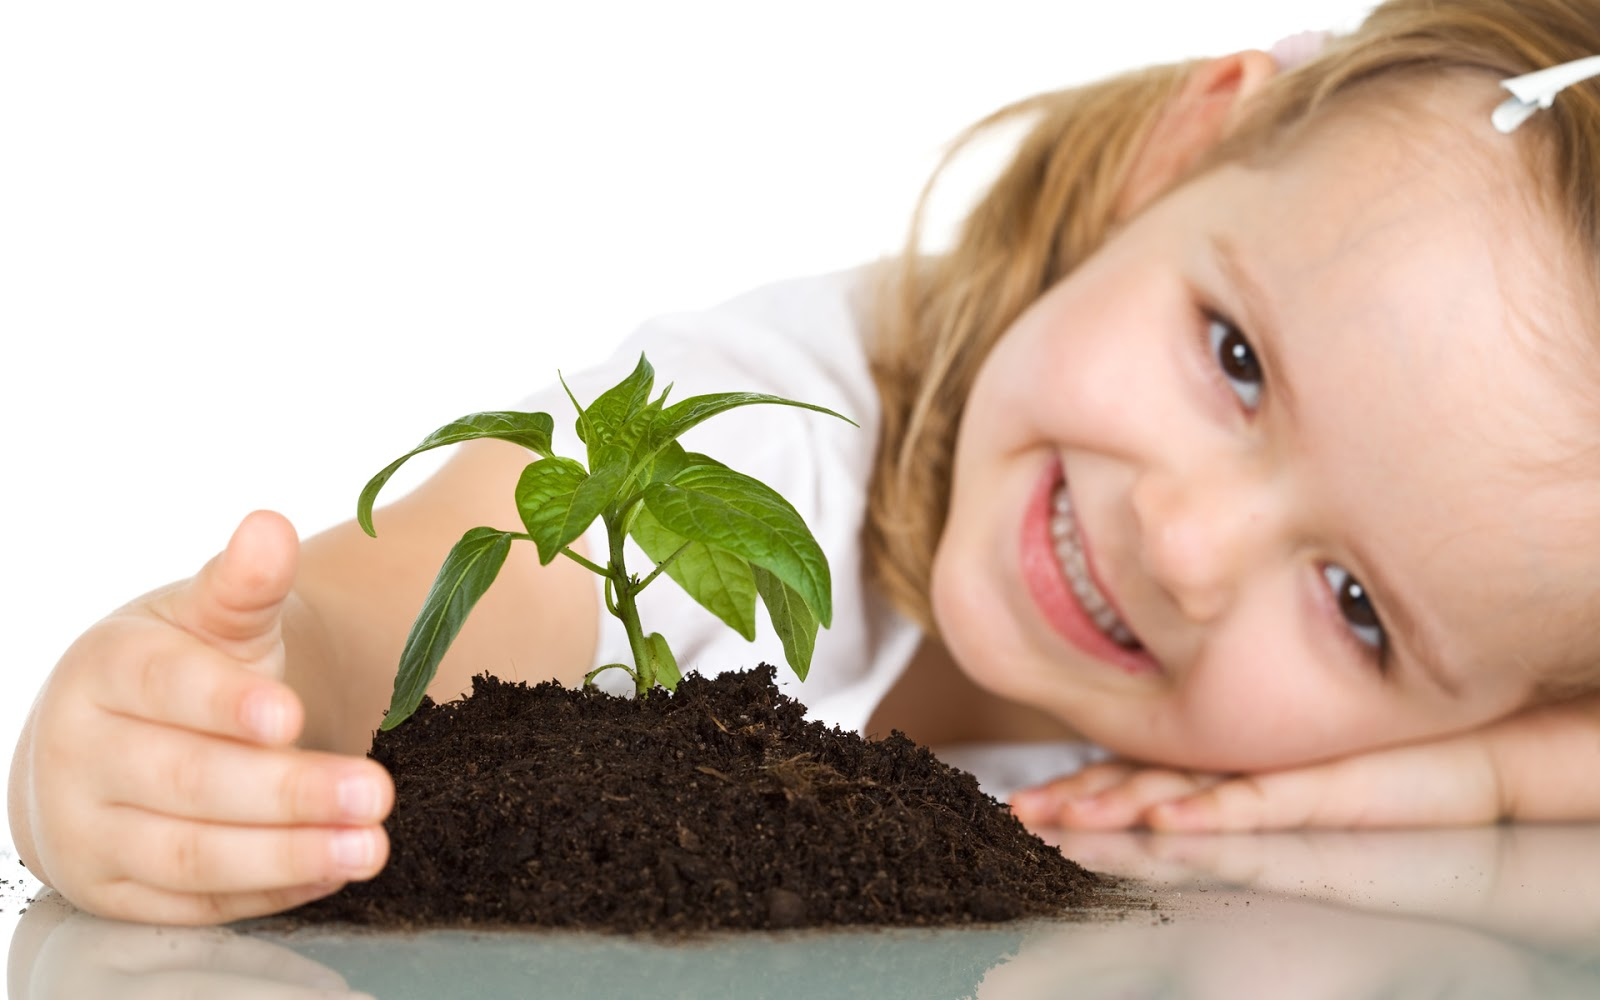 http://3.bp.blogspot.com/-mHPCJQCKu7Q/UJvRC_R7nWI/AAAAAAAAADk/V9Gnwfe9Gbg/s1600/cute-baby-girl-plant-wallpaper.jpg